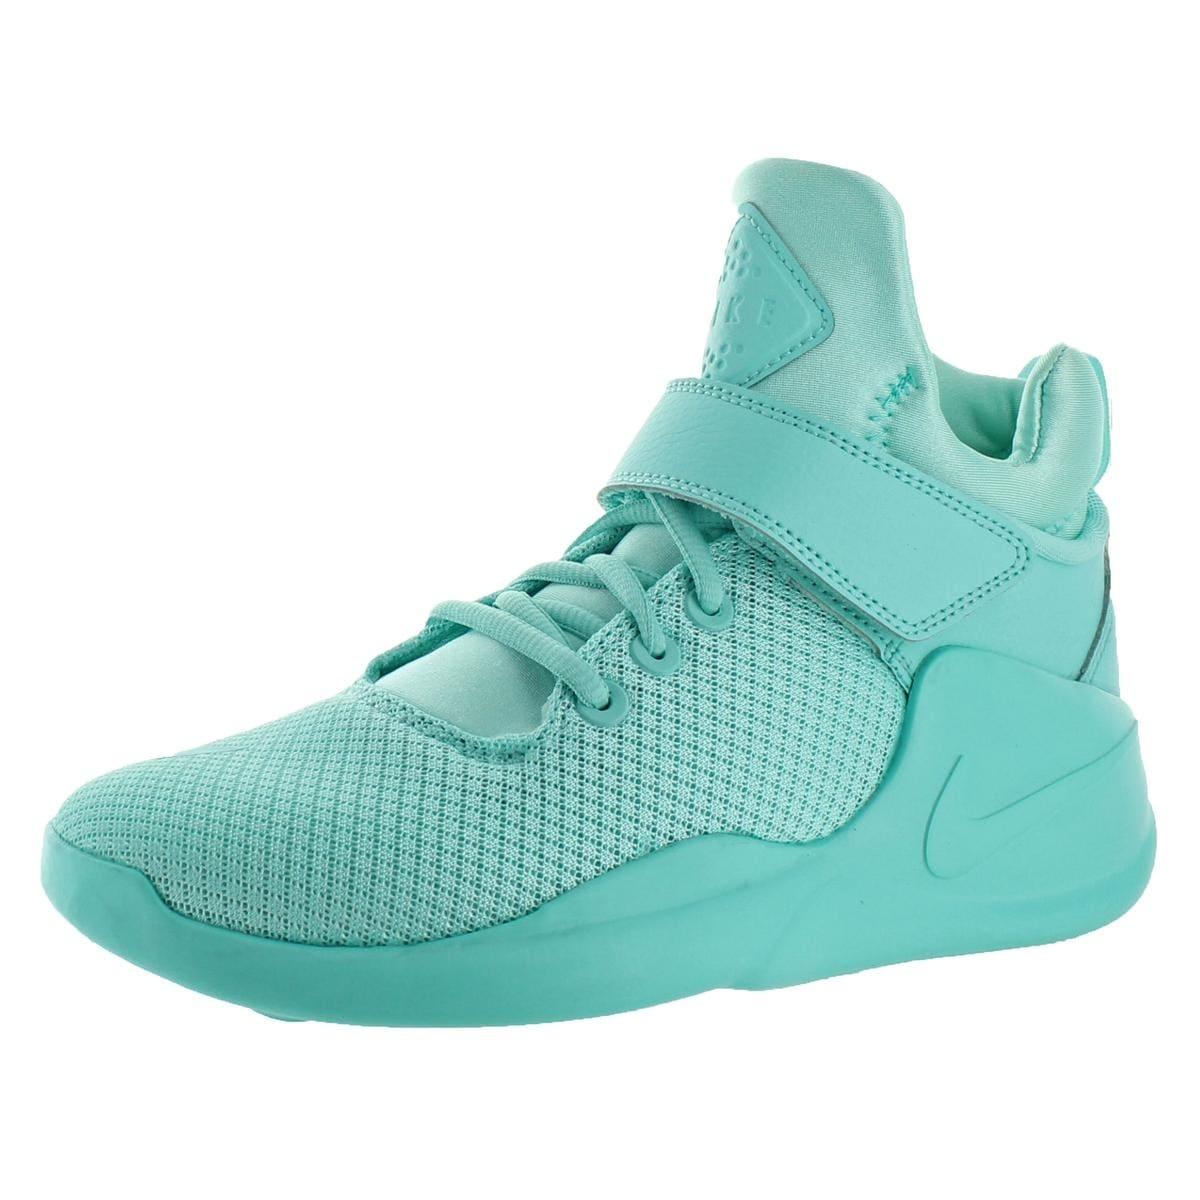 Shop Nike Womens Kwazi Basketball Shoes Mid Trainer - Free Shipping ... 2bbe7645c0